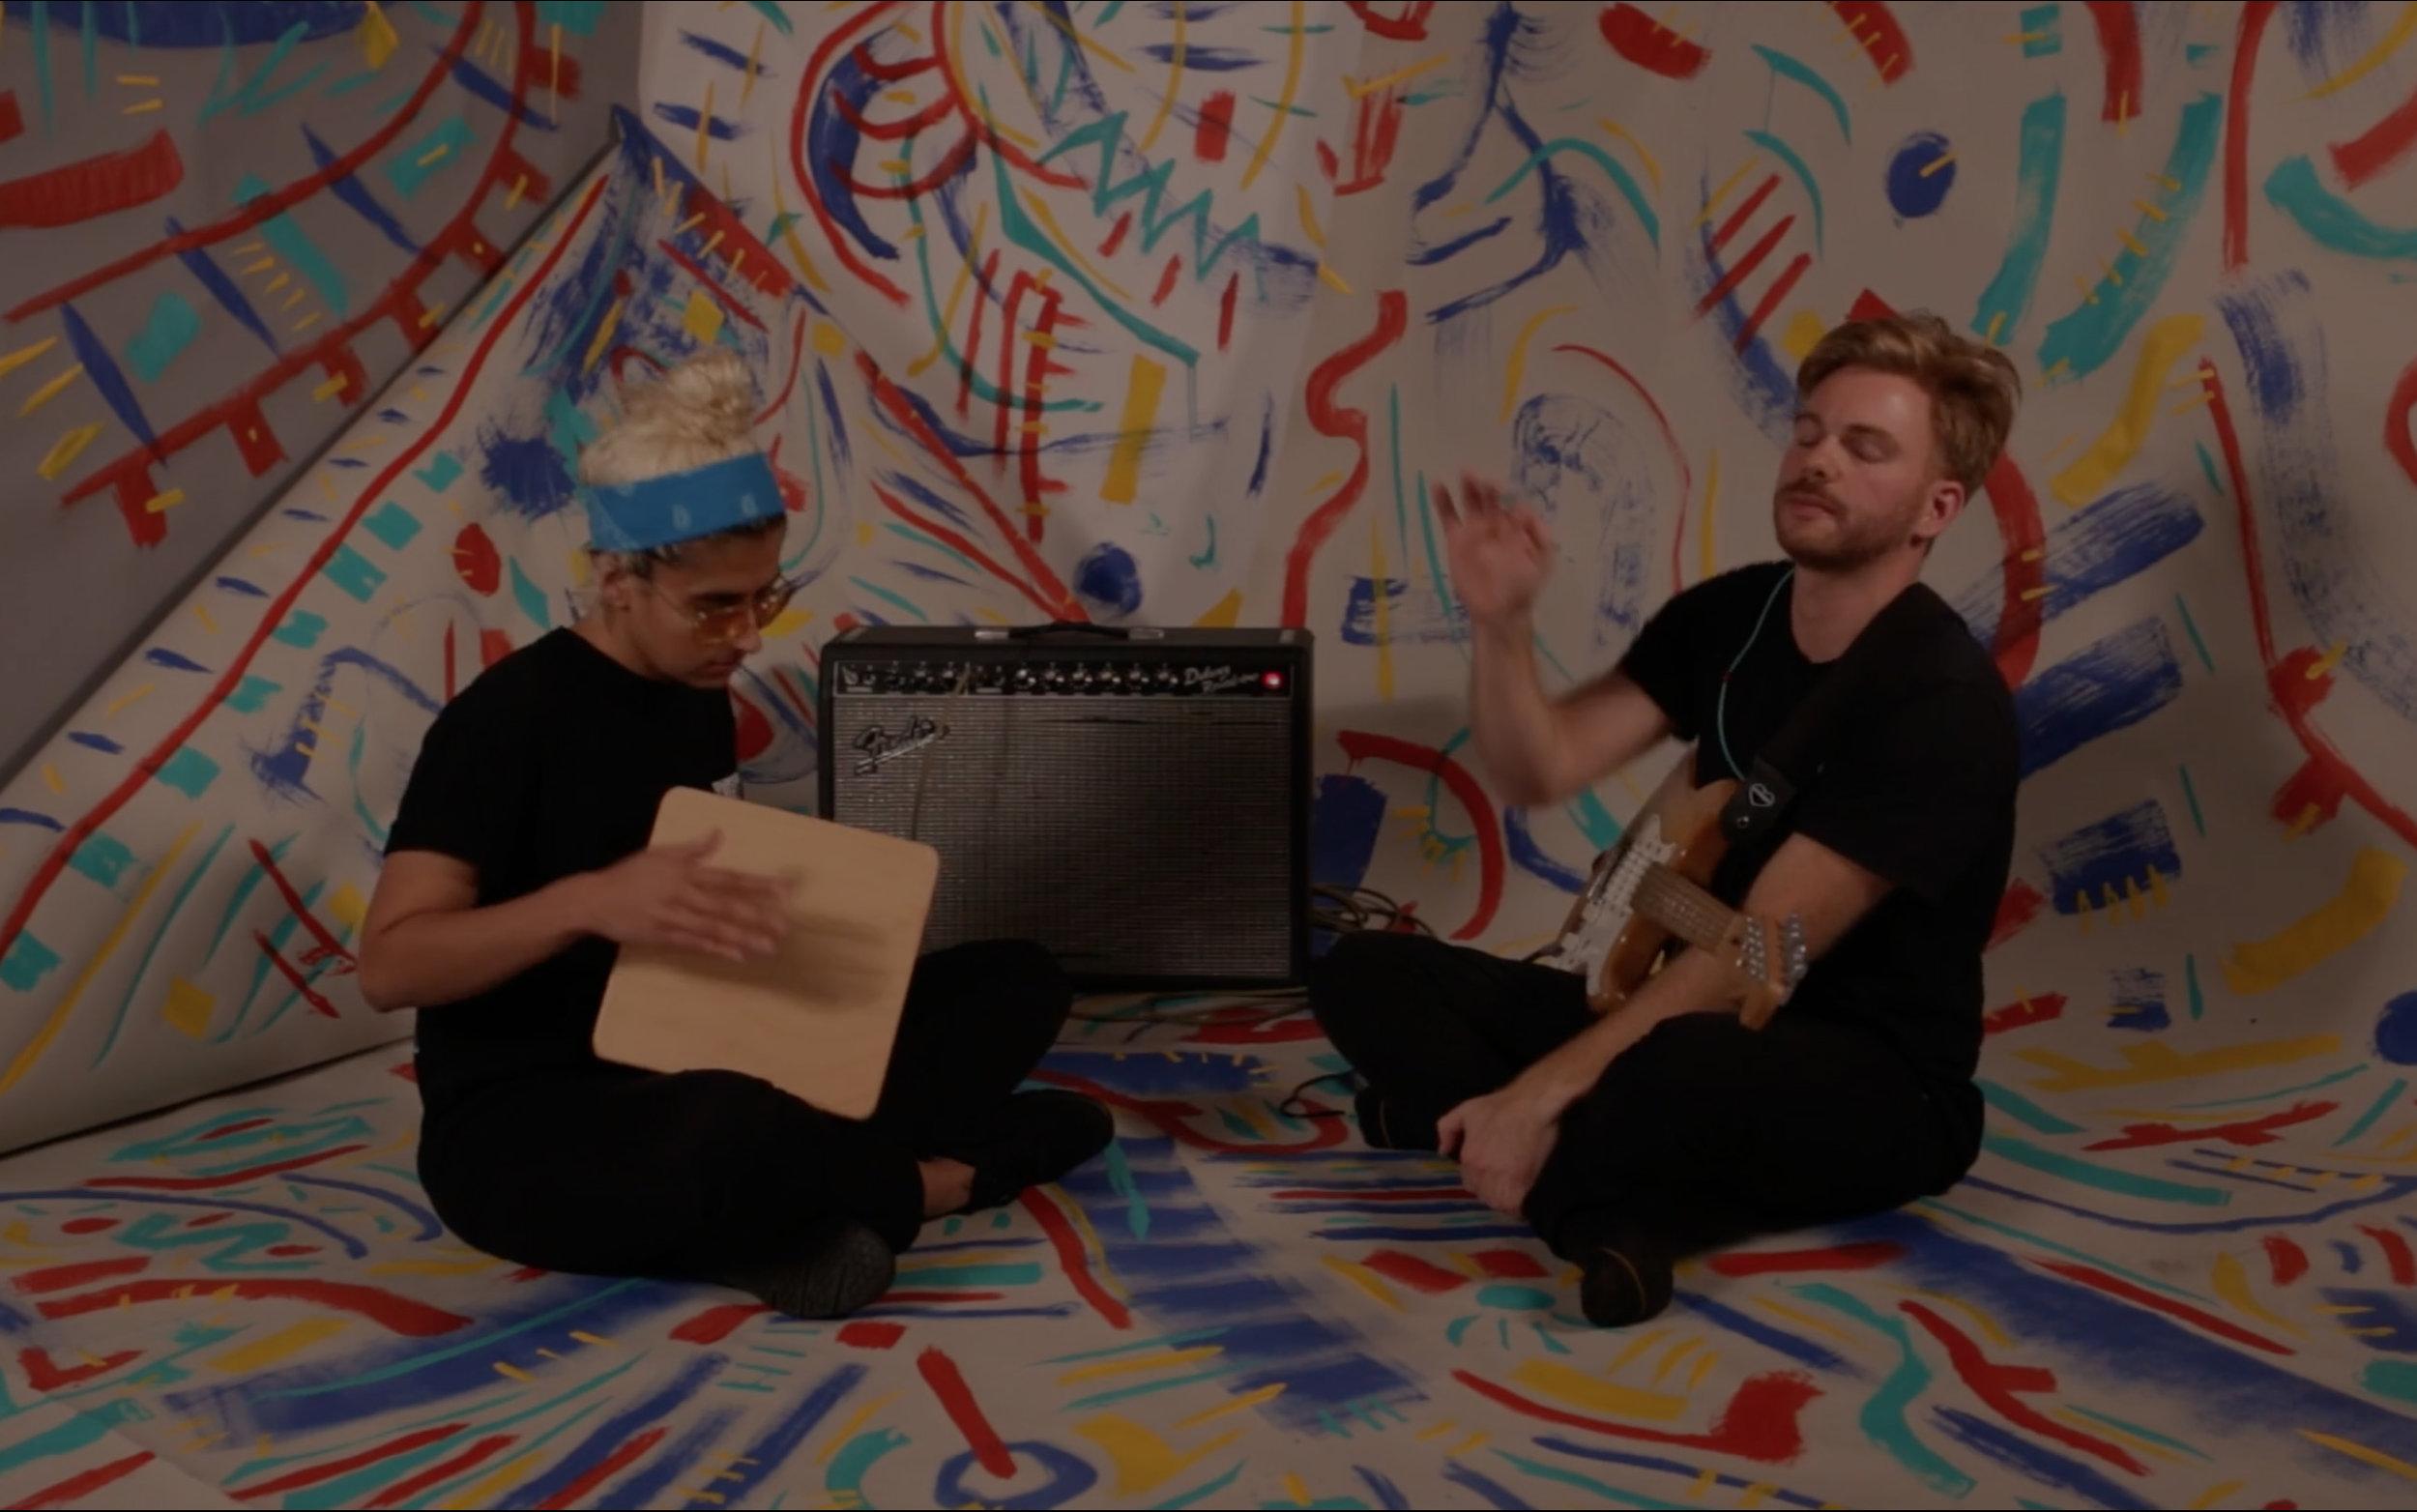 'Make art' - Space Design + Music with Madame Gandhi